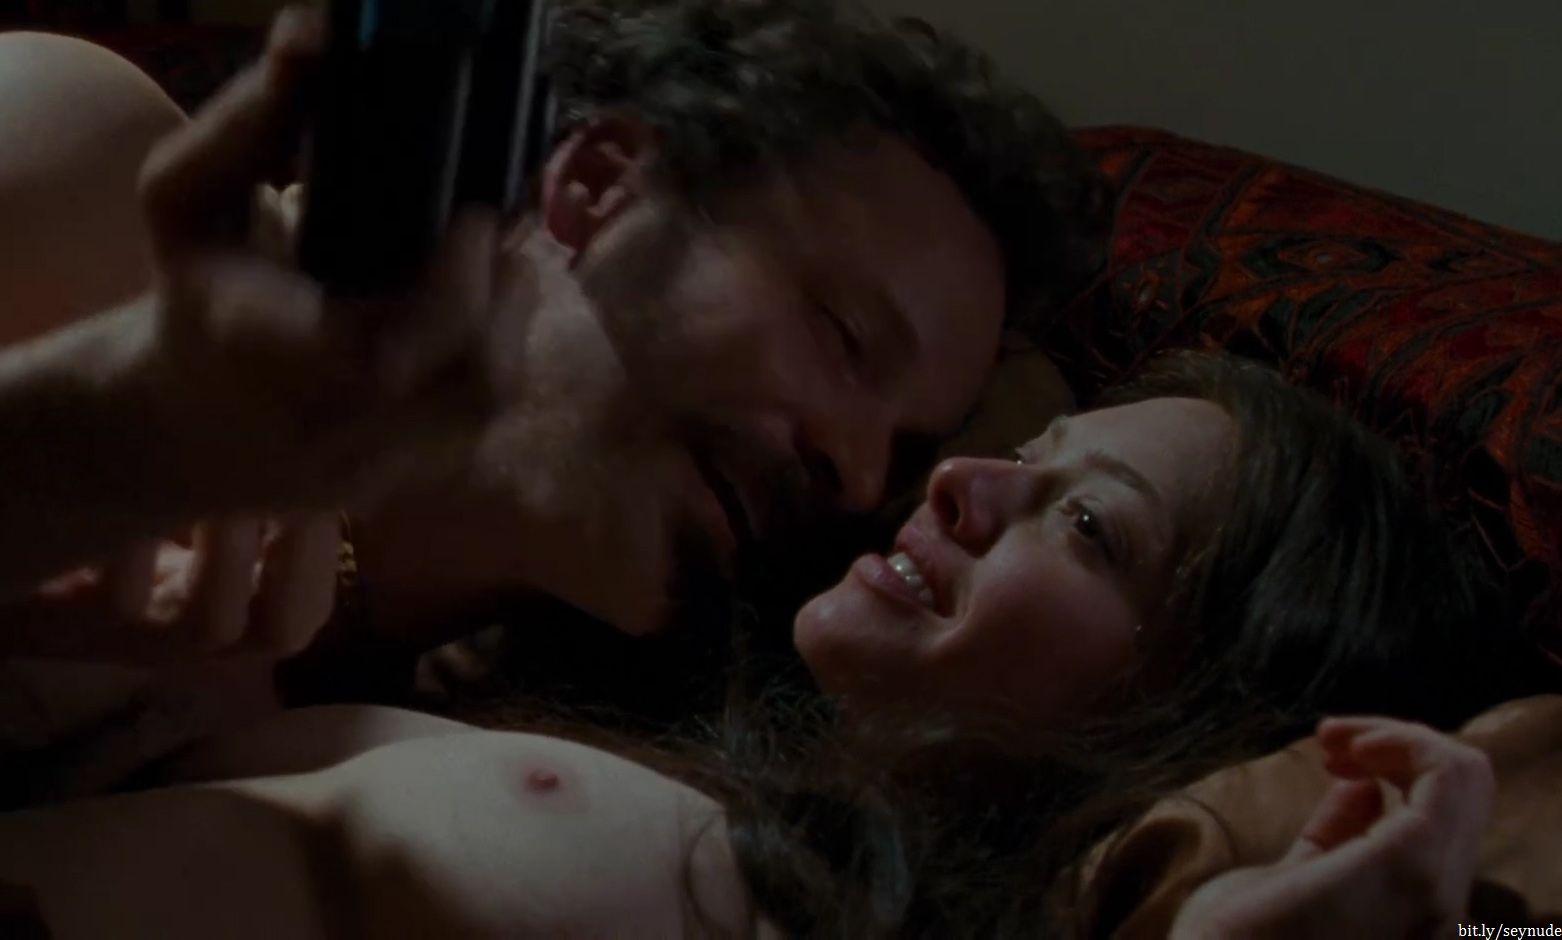 Amanda Seyfried Nude In Time amanda seyfried nudes are beautiful as hell (27 pics)